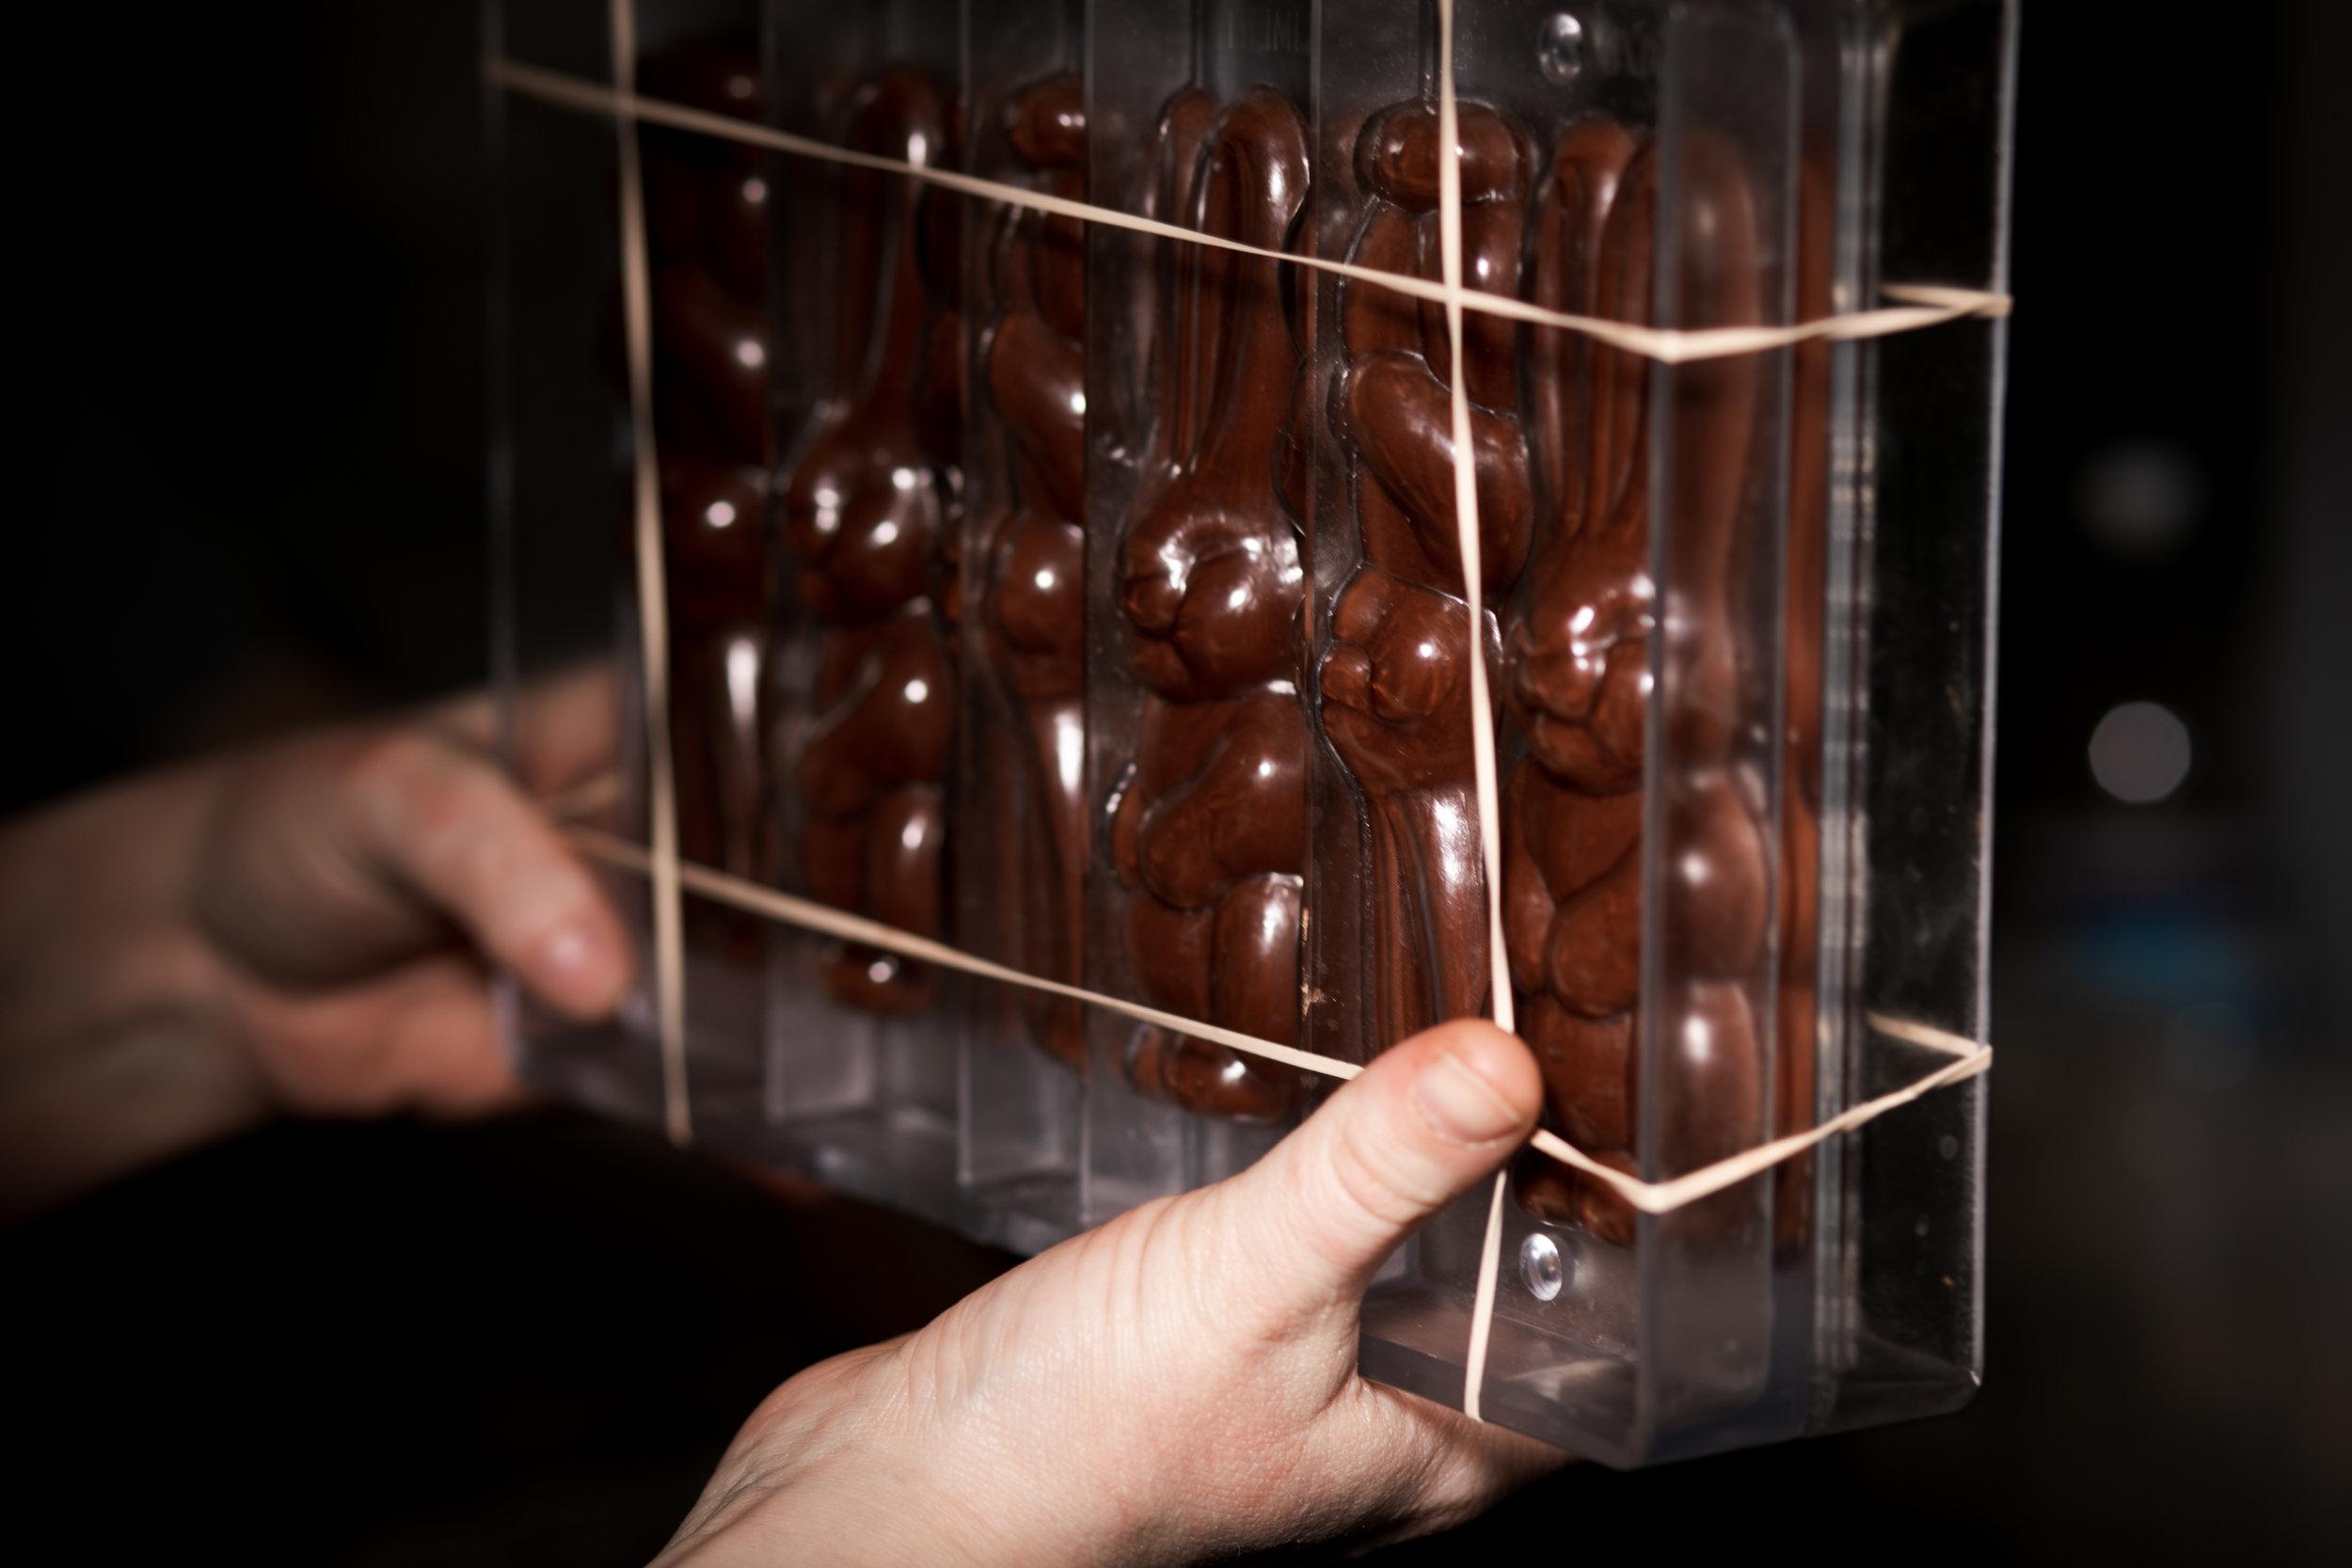 Chocolate molding